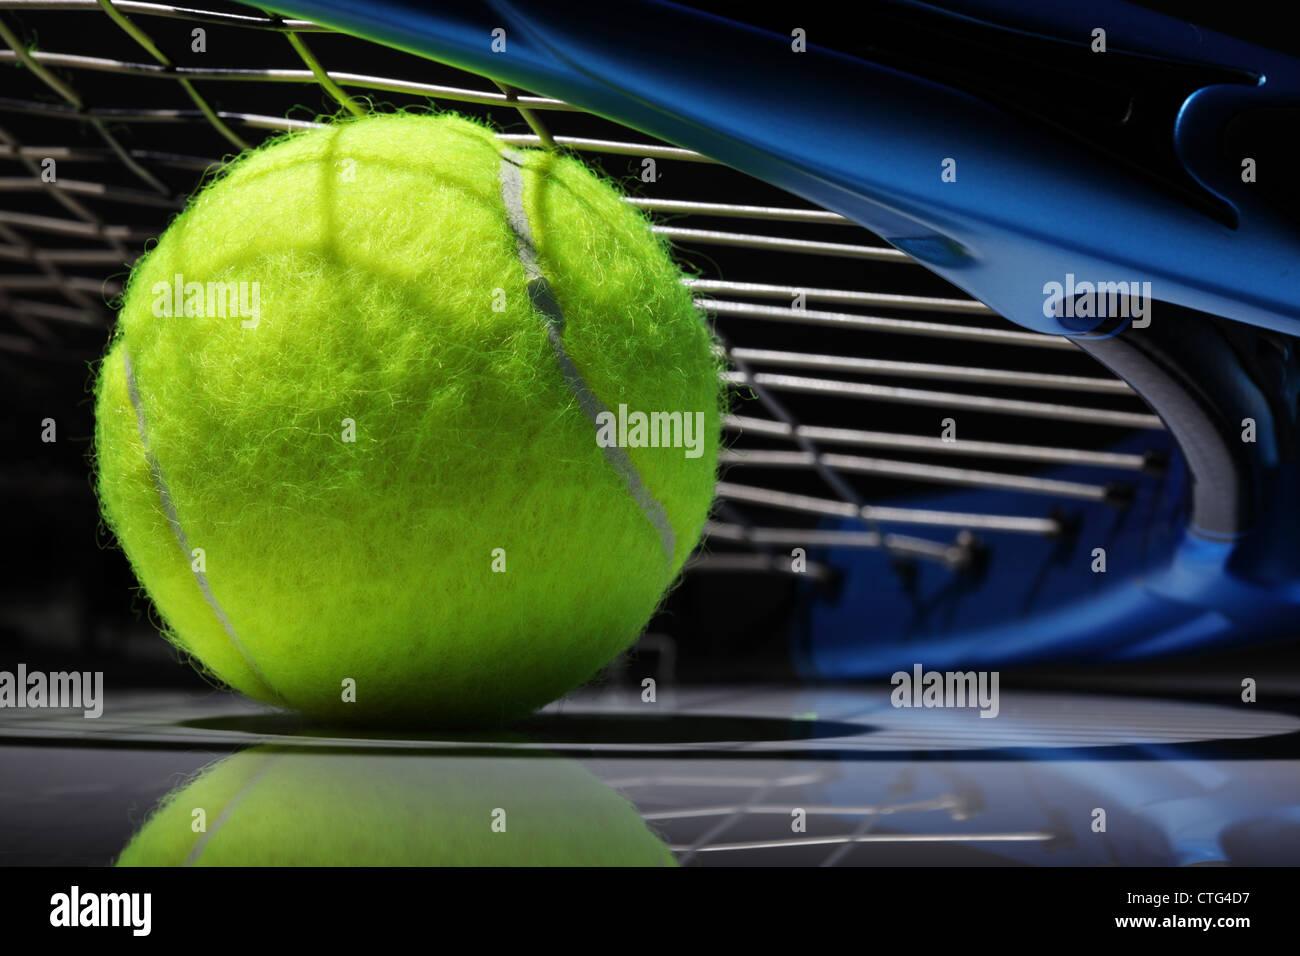 Tennis racket and ball - Stock Image